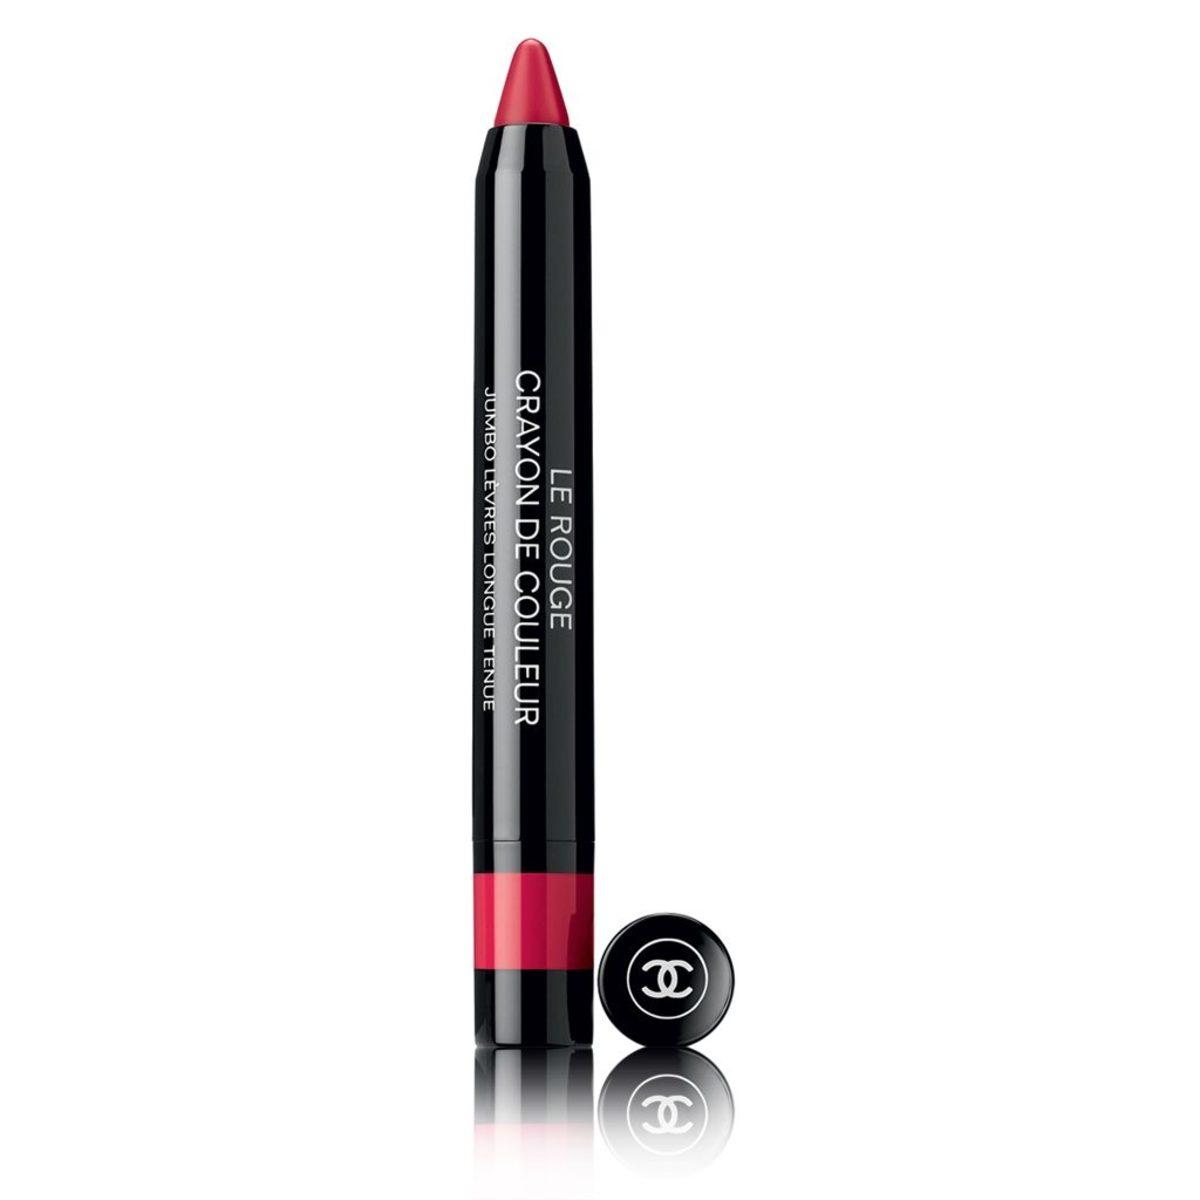 Rouge Crayon Couleur 1.2g #06 [Parallel Import]